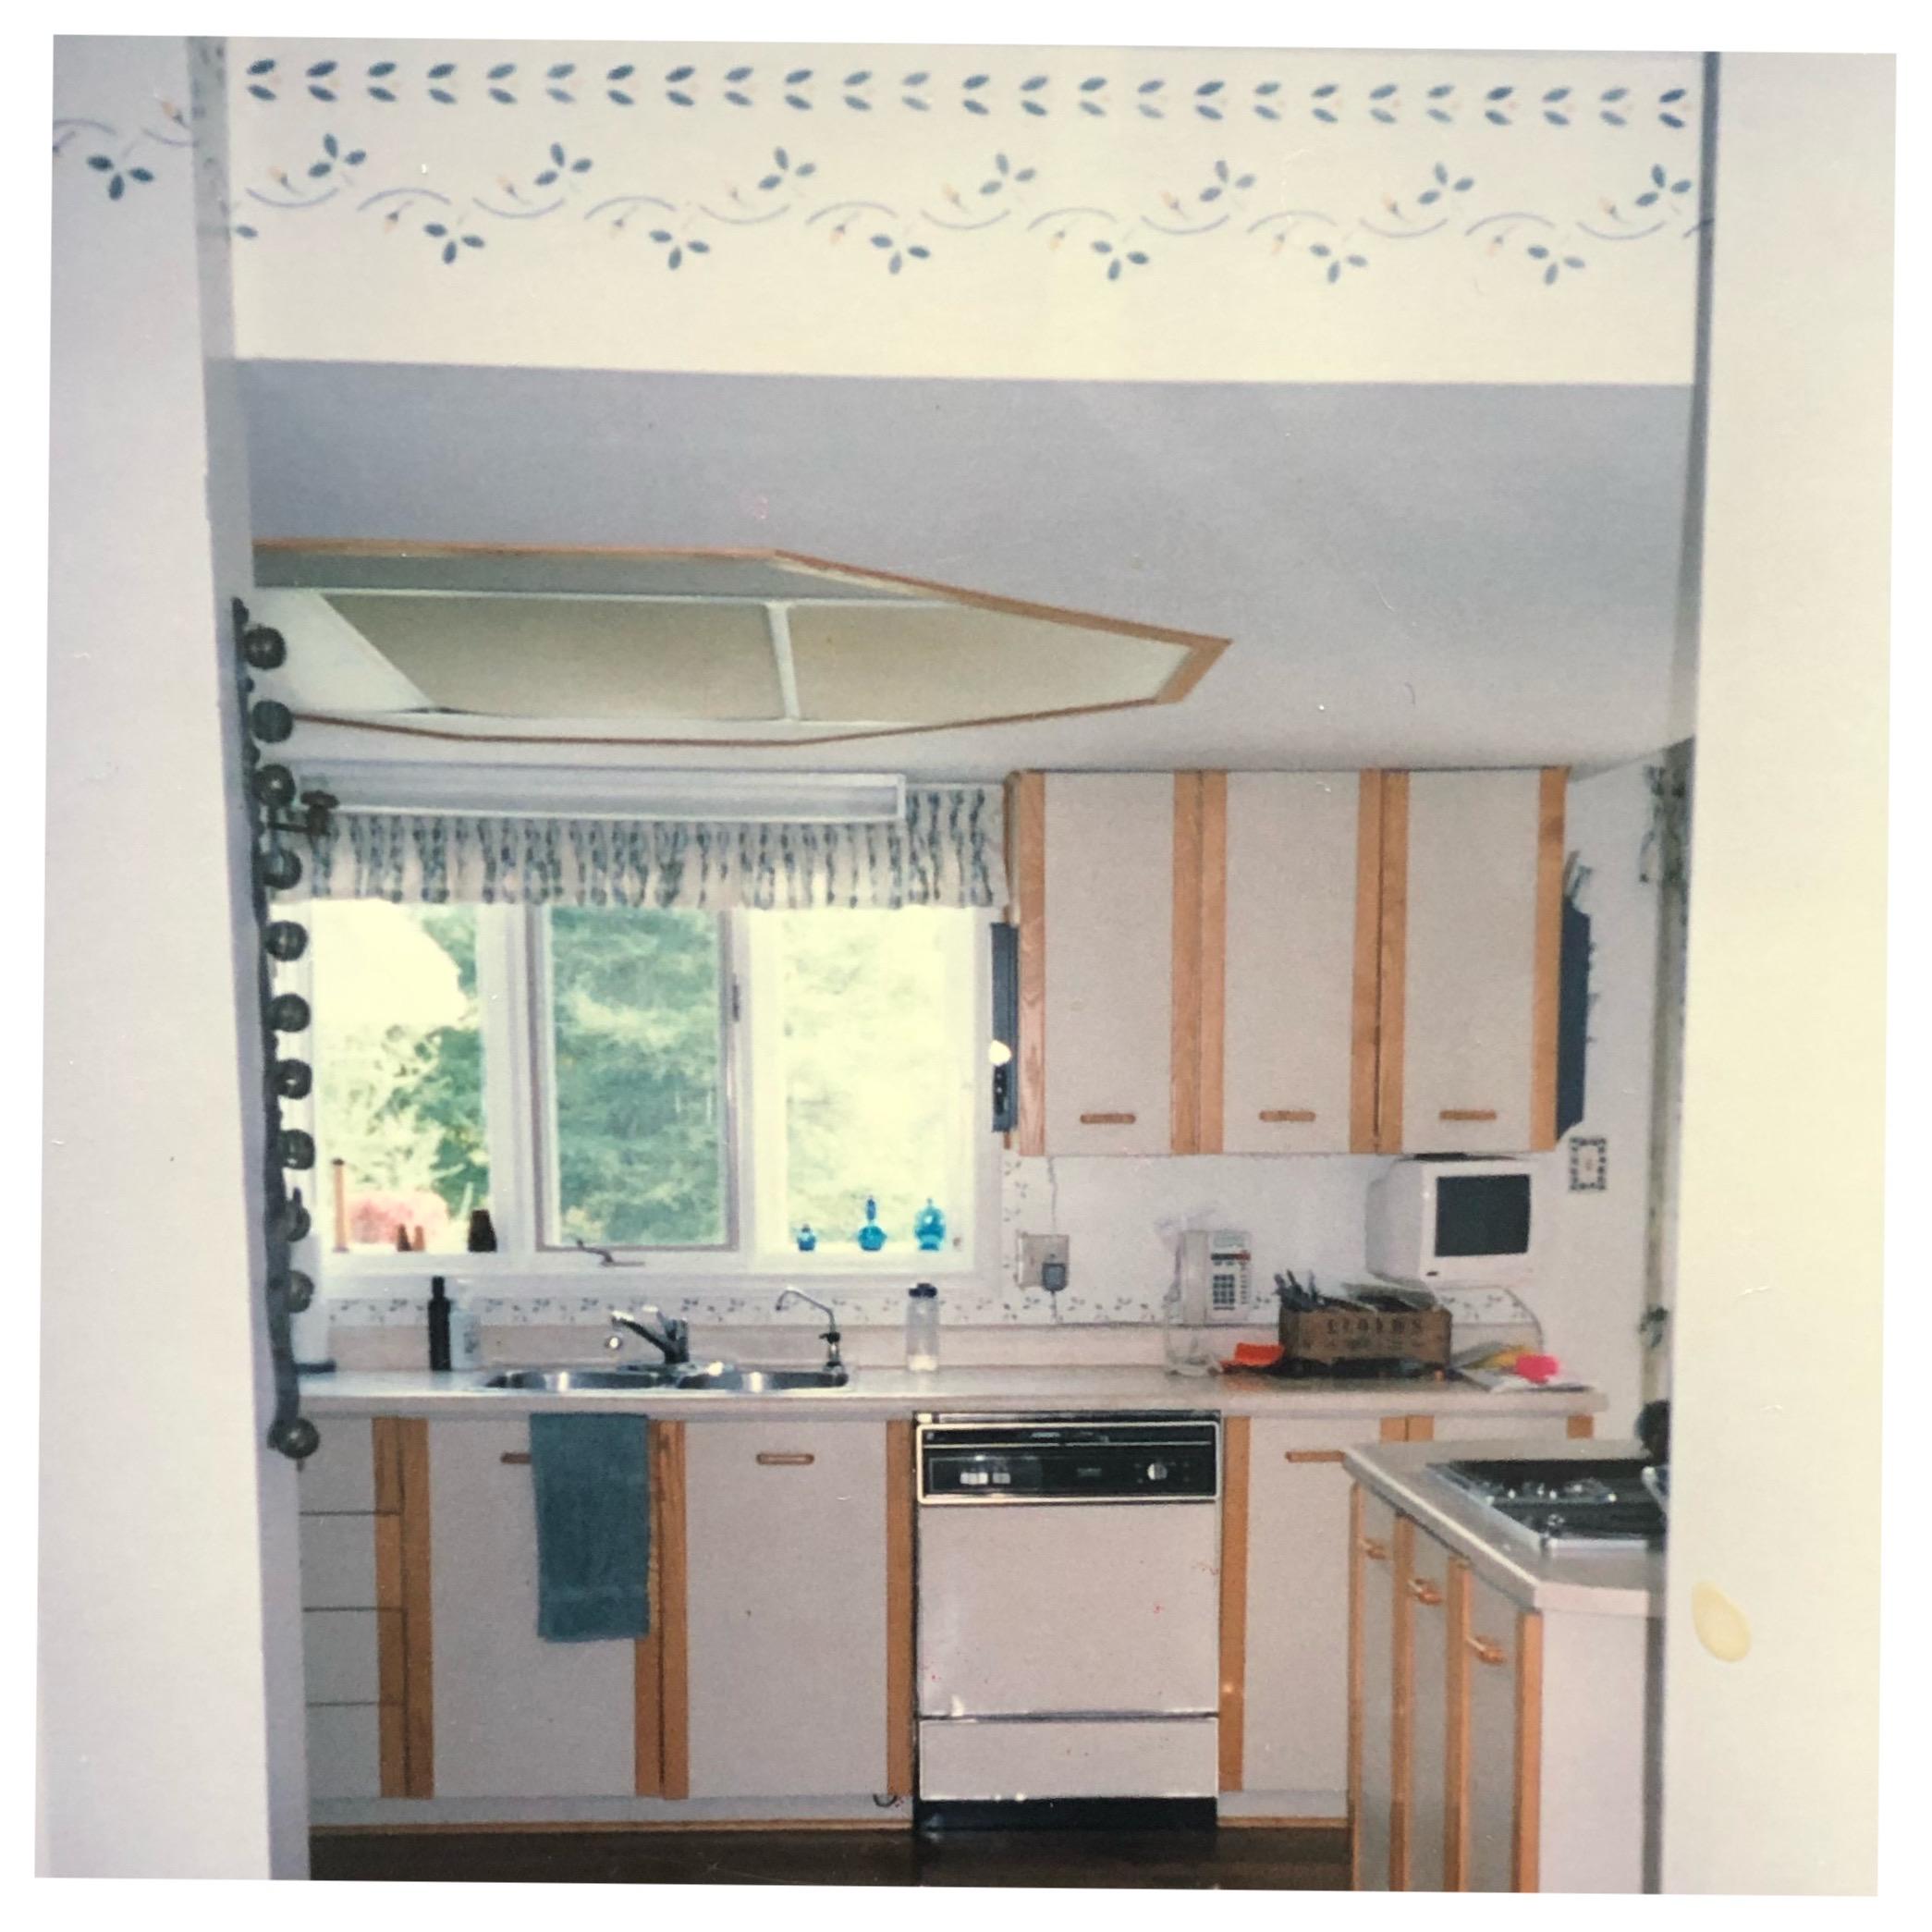 Original Kitchen circa 1989